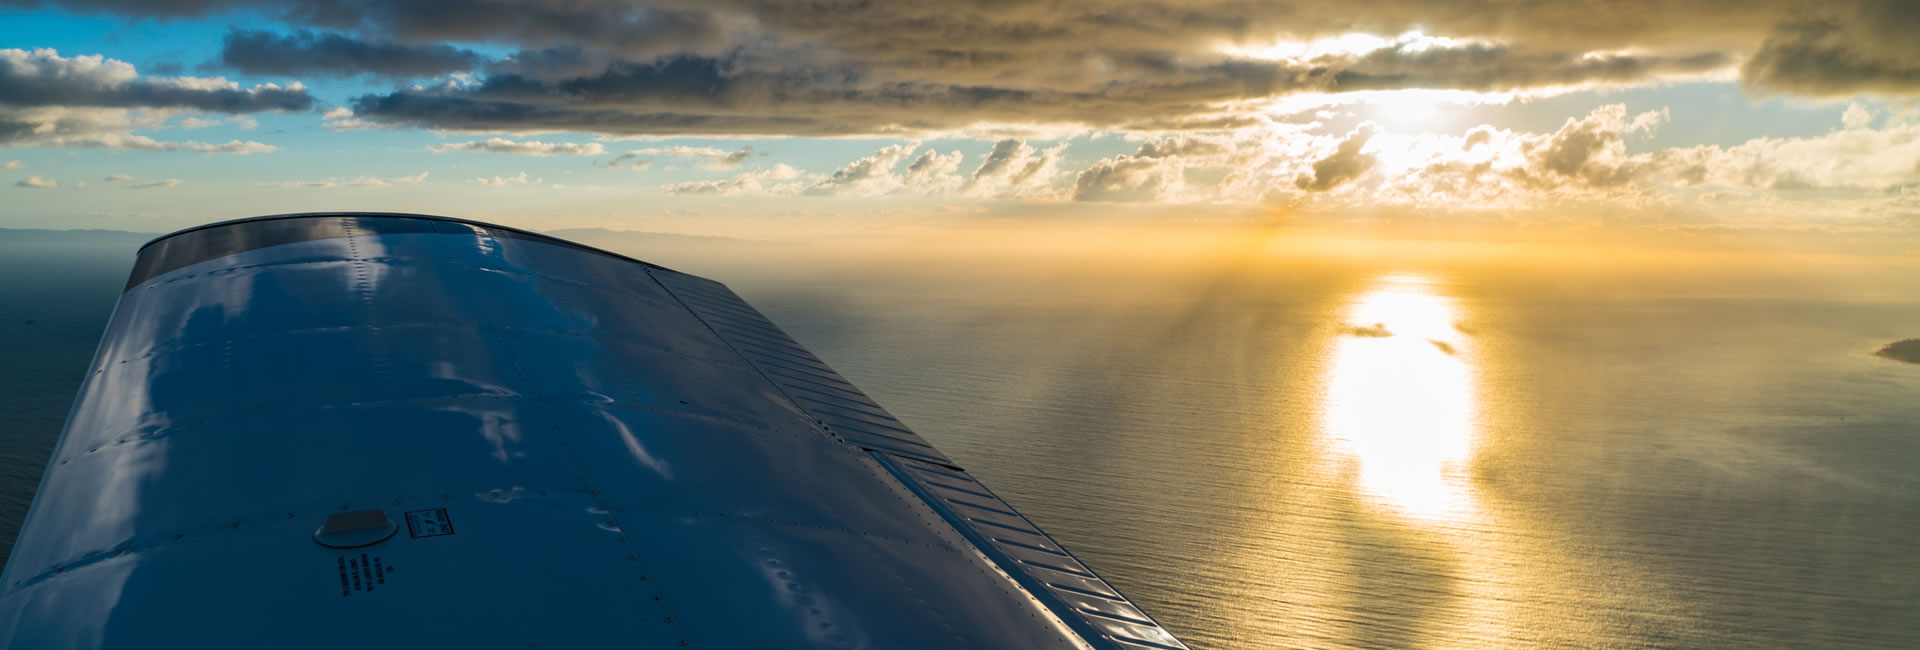 Flying over ocean at Sunset